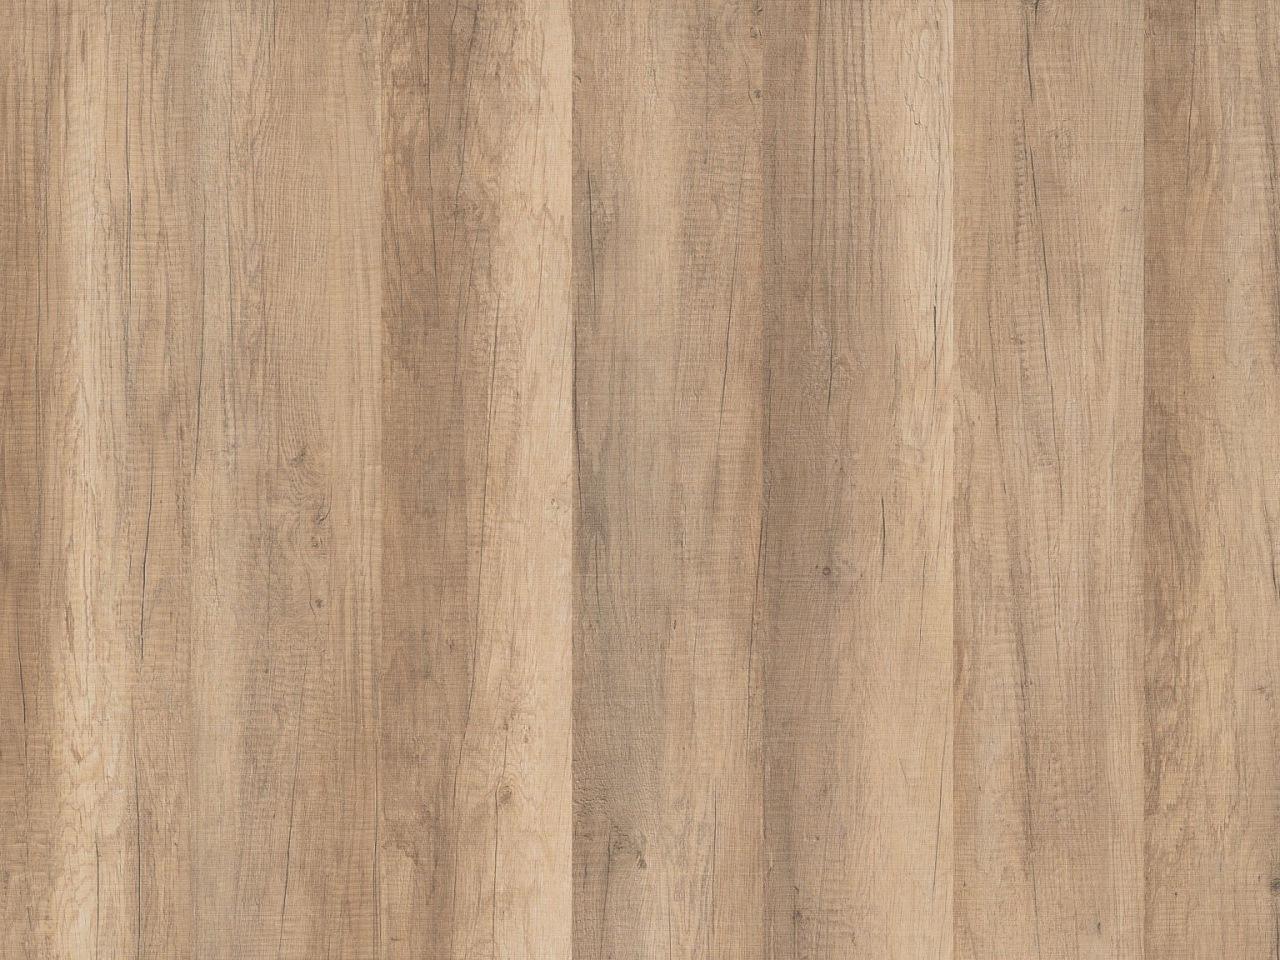 Laminatboden Woody new – Panama Oak, wn0008